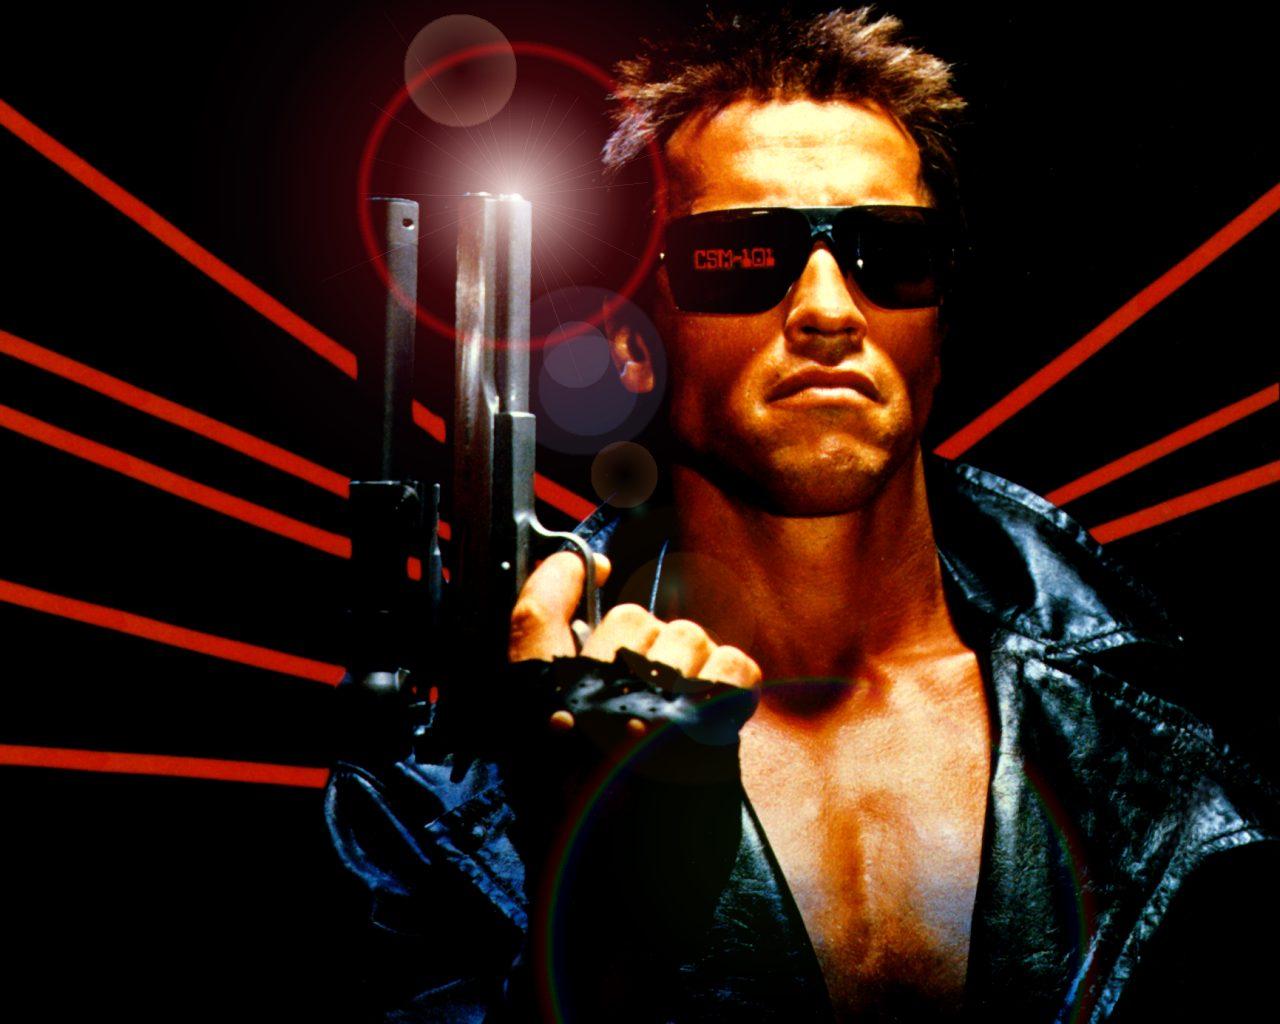 Free Download For U Arnold Schwarzenegger Terminator Is